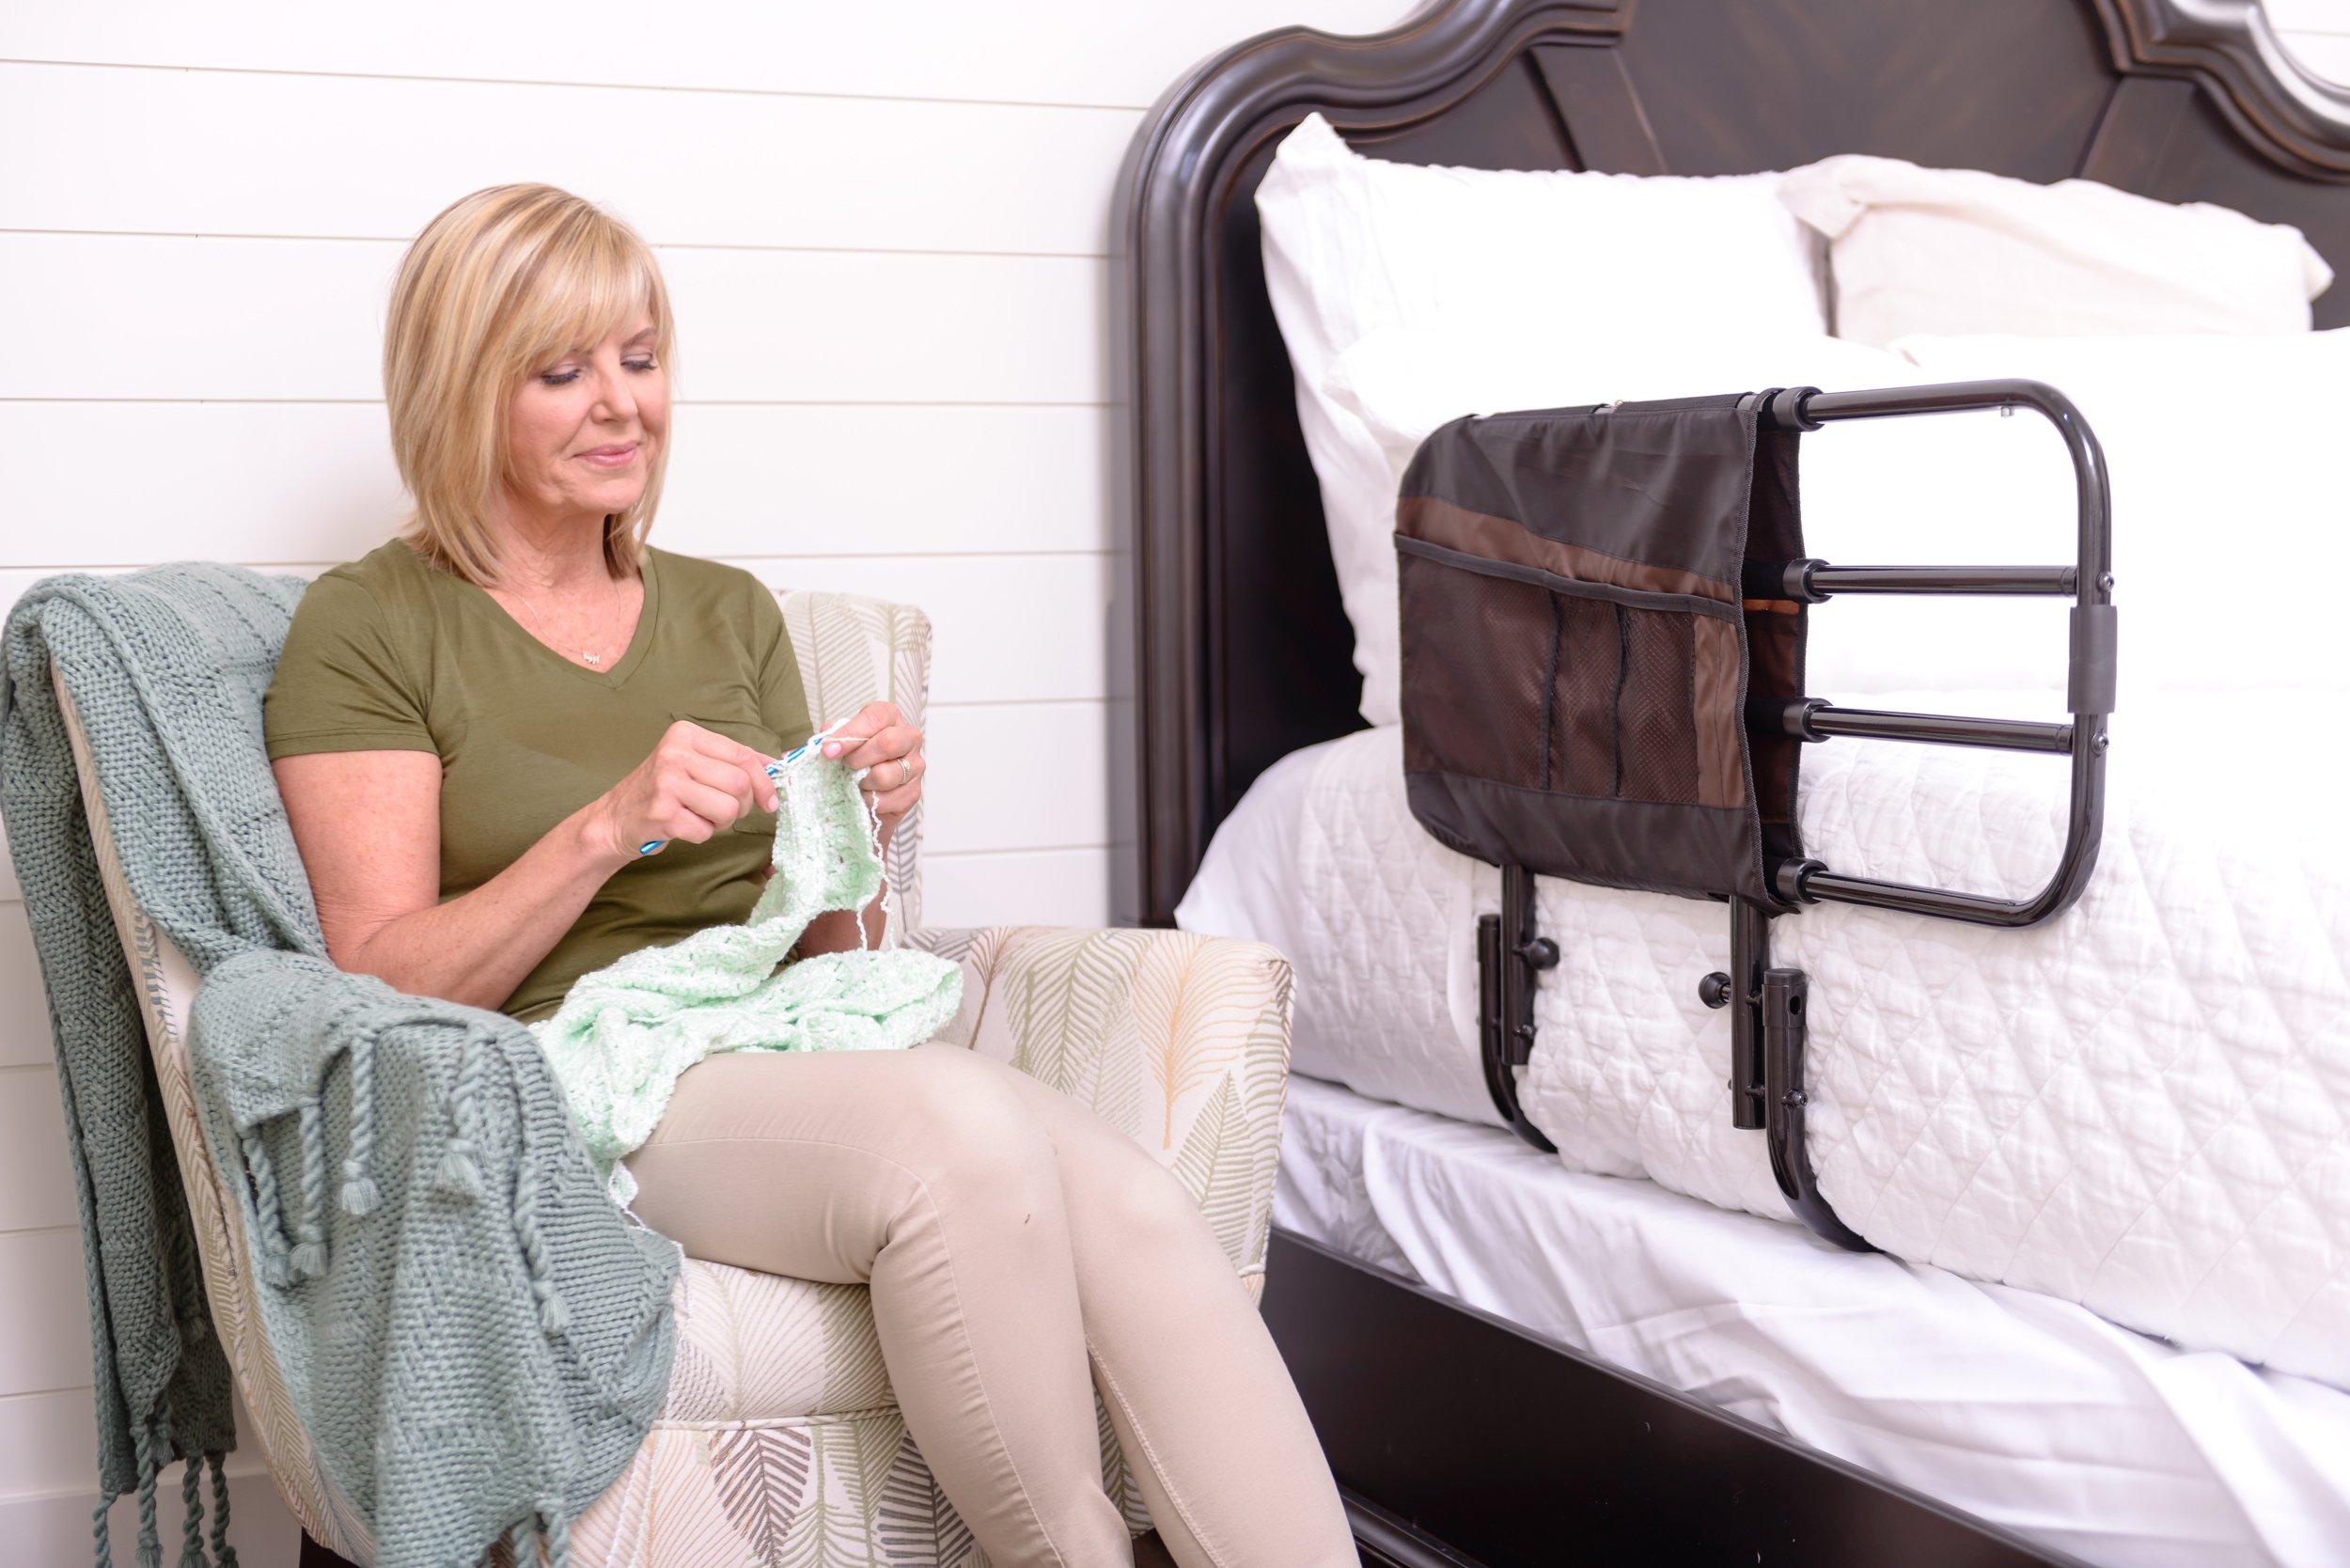 buy pp safety accessories images bed side elderly hospital rails medical for